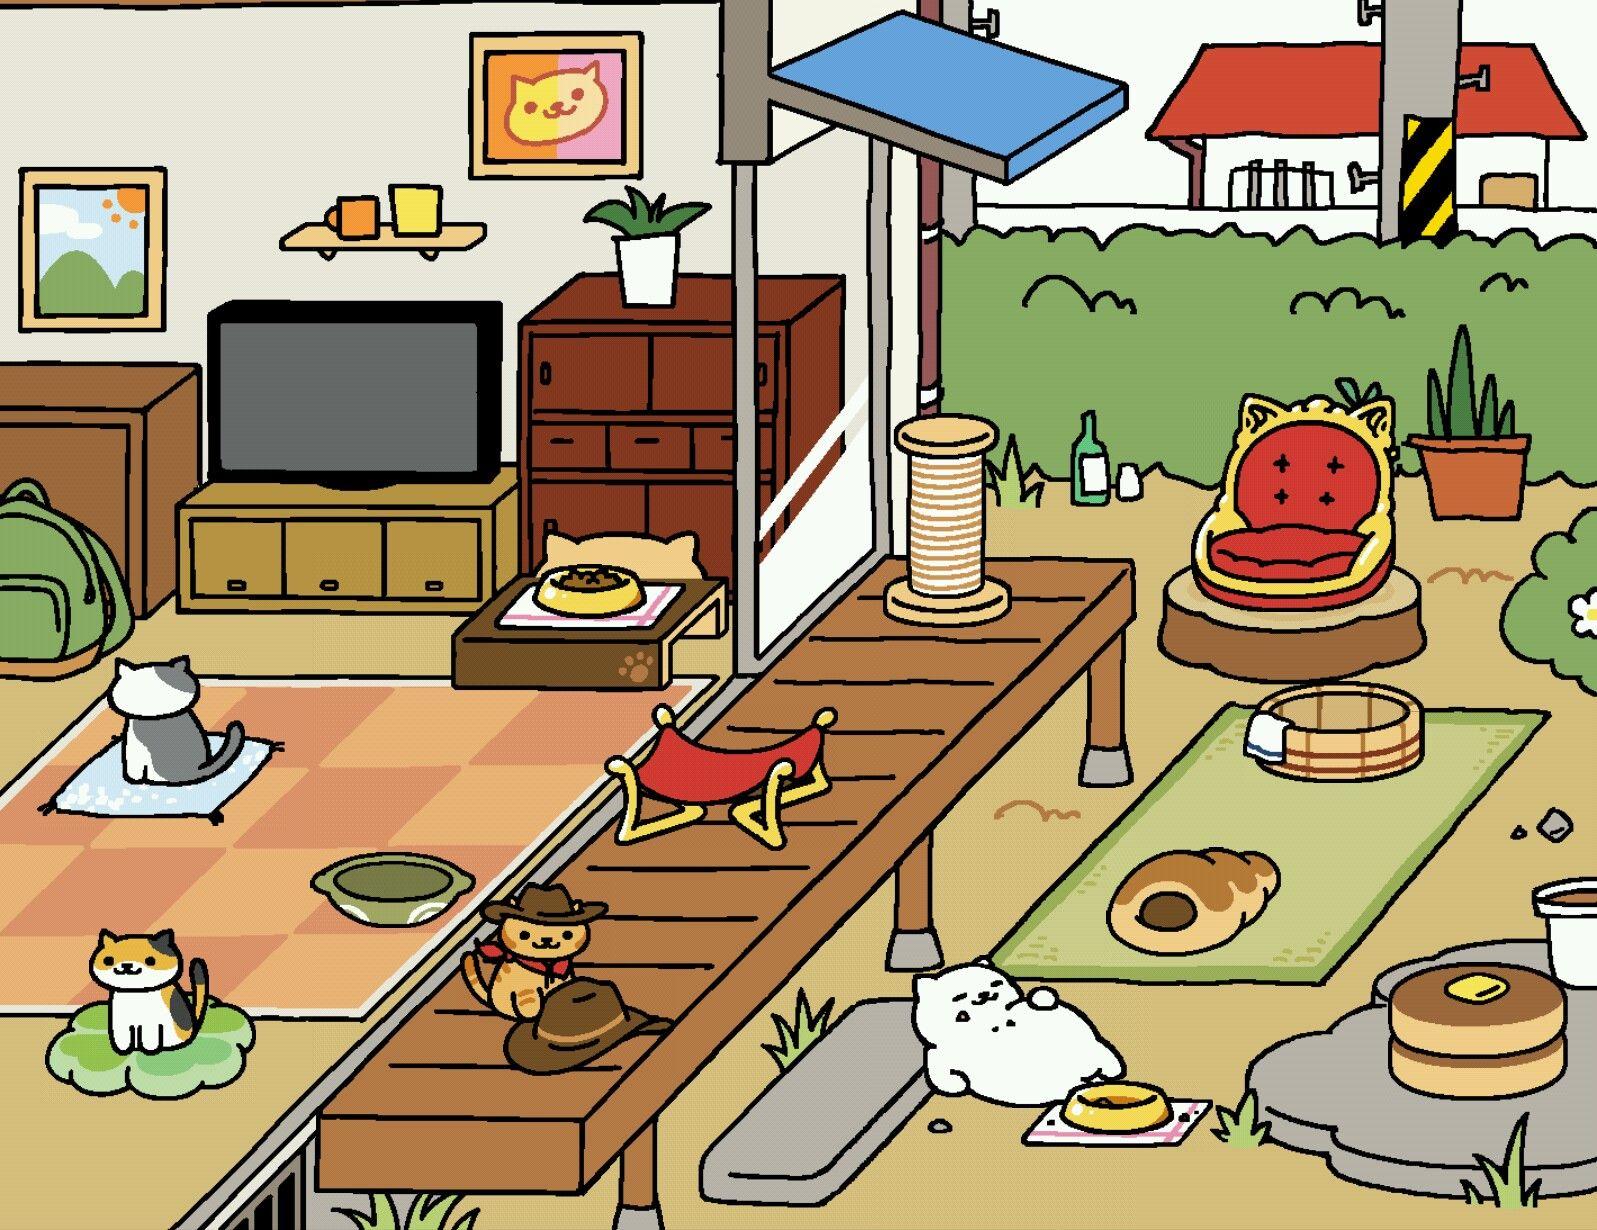 Finally Found Billy The Kitten Neko Atsume Atsume Neko Atsume Kitty Collector